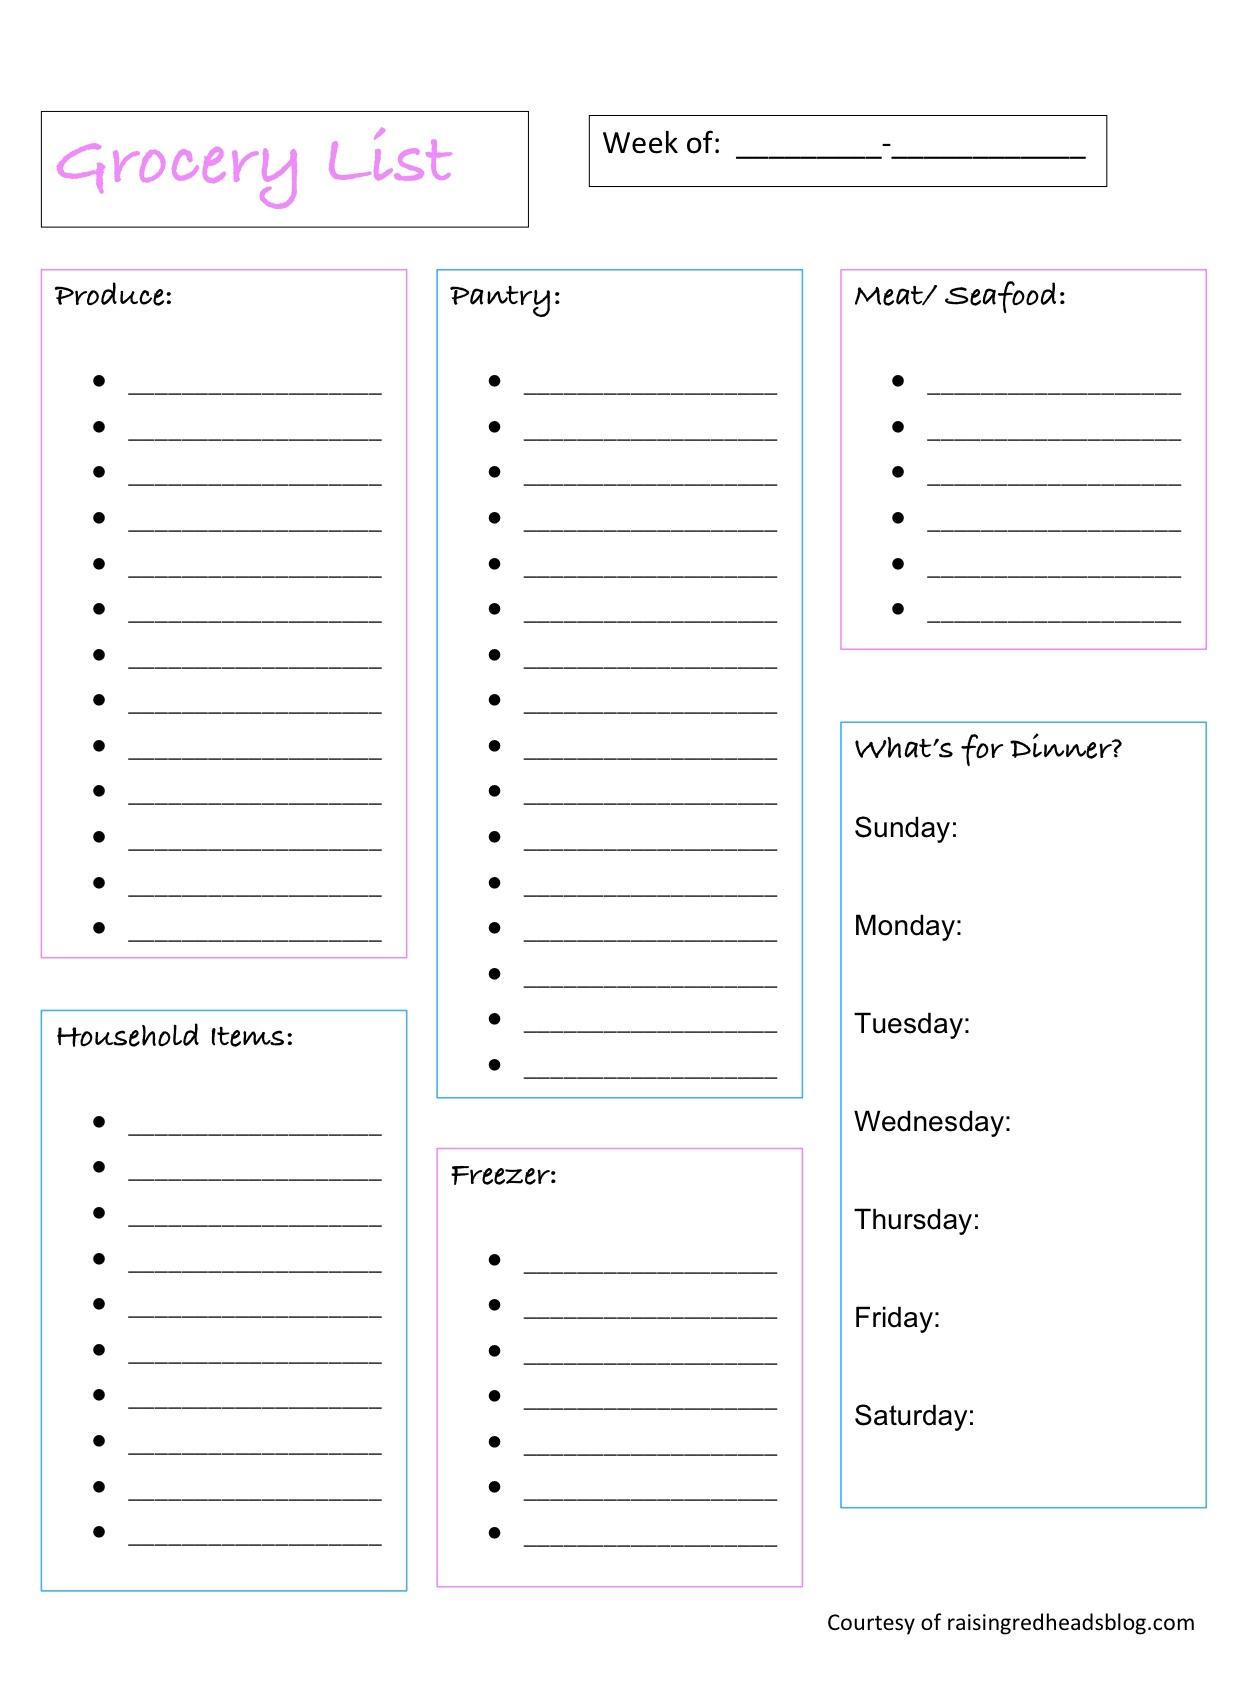 Printable Grocery List - Raising Redheads - Free Printable Grocery List